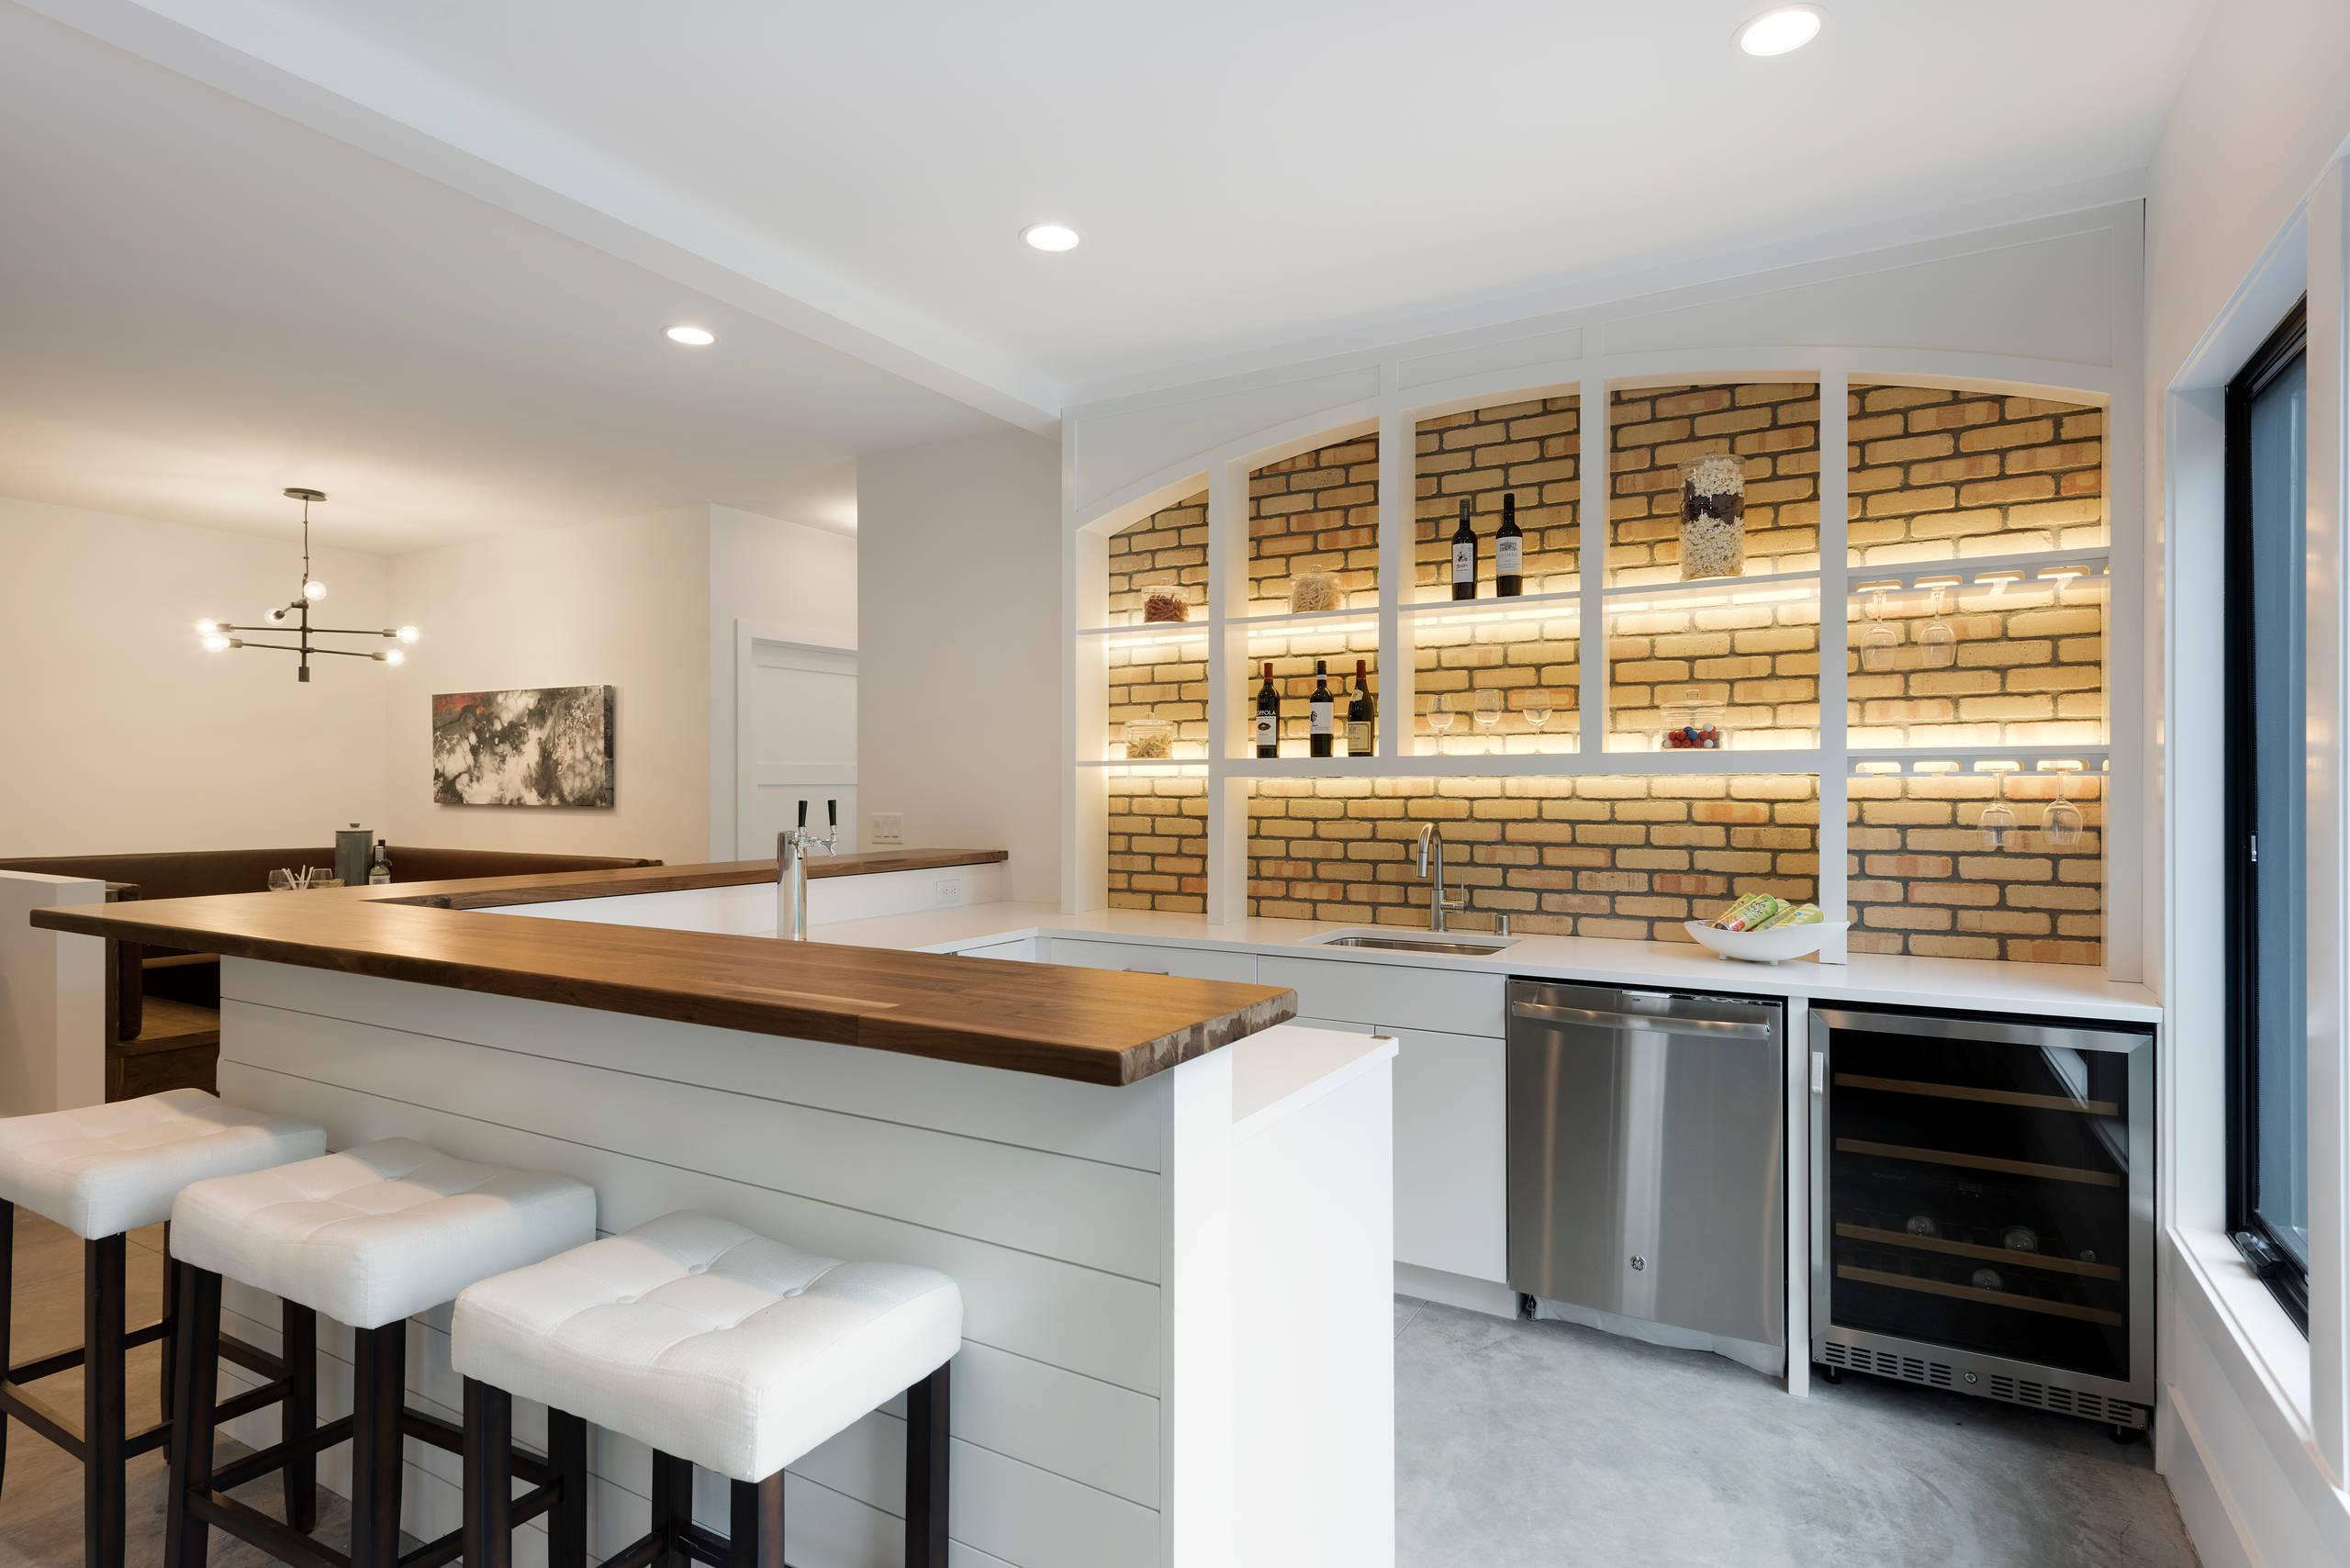 75 Beautiful Modern Concrete Floor Home Bar Pictures Ideas December 2020 Houzz